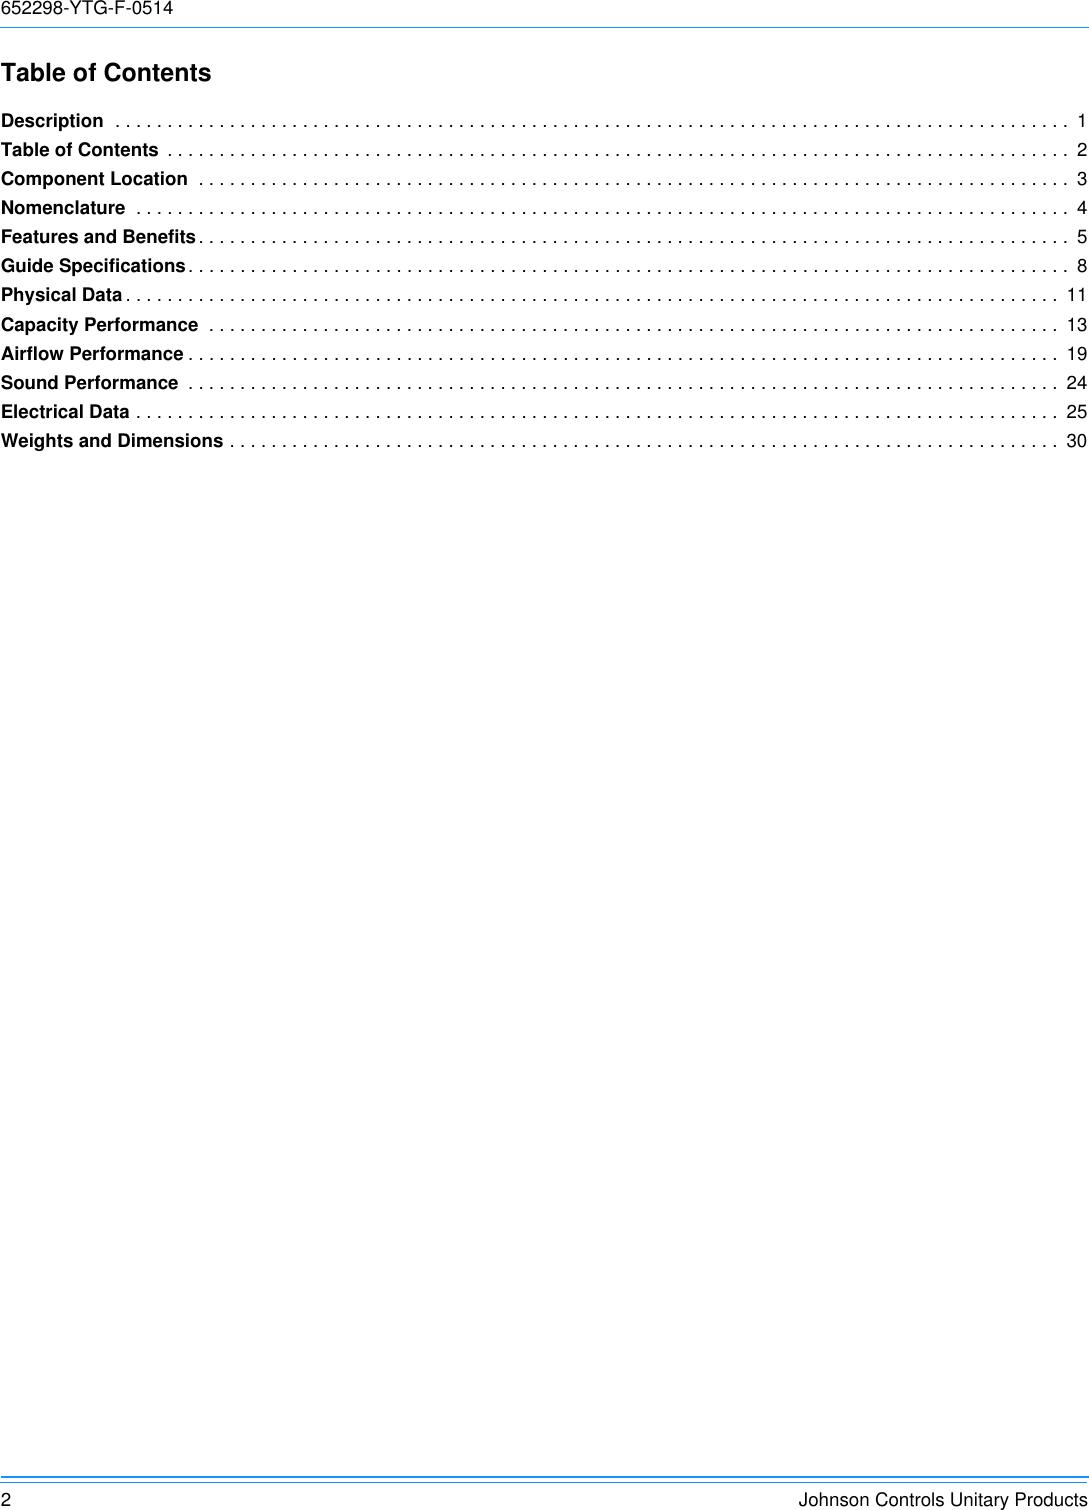 York Xp Sunline Technical Guide 652298 YTG F 0514 Xp York Heat Pump Wiring Diagram on